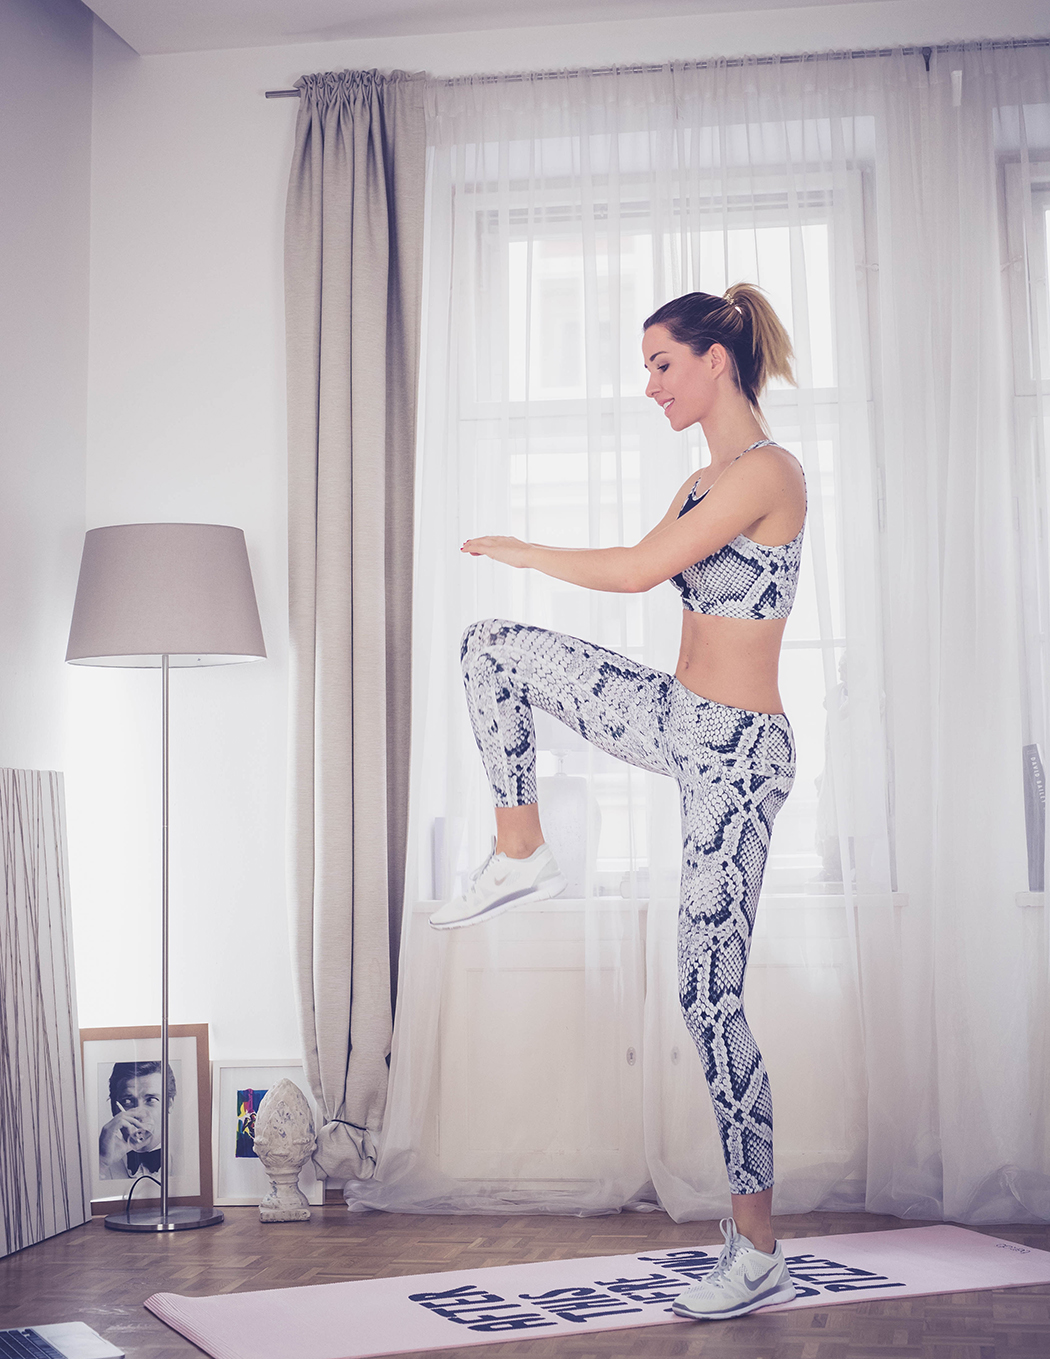 Fitnessblog-Fitnessblogger-Fitness-Blog-Blogger-Gymondo-Gutschein-Rabatt-Discount-Lindarella-Hometraining-Homeworkout-12-web